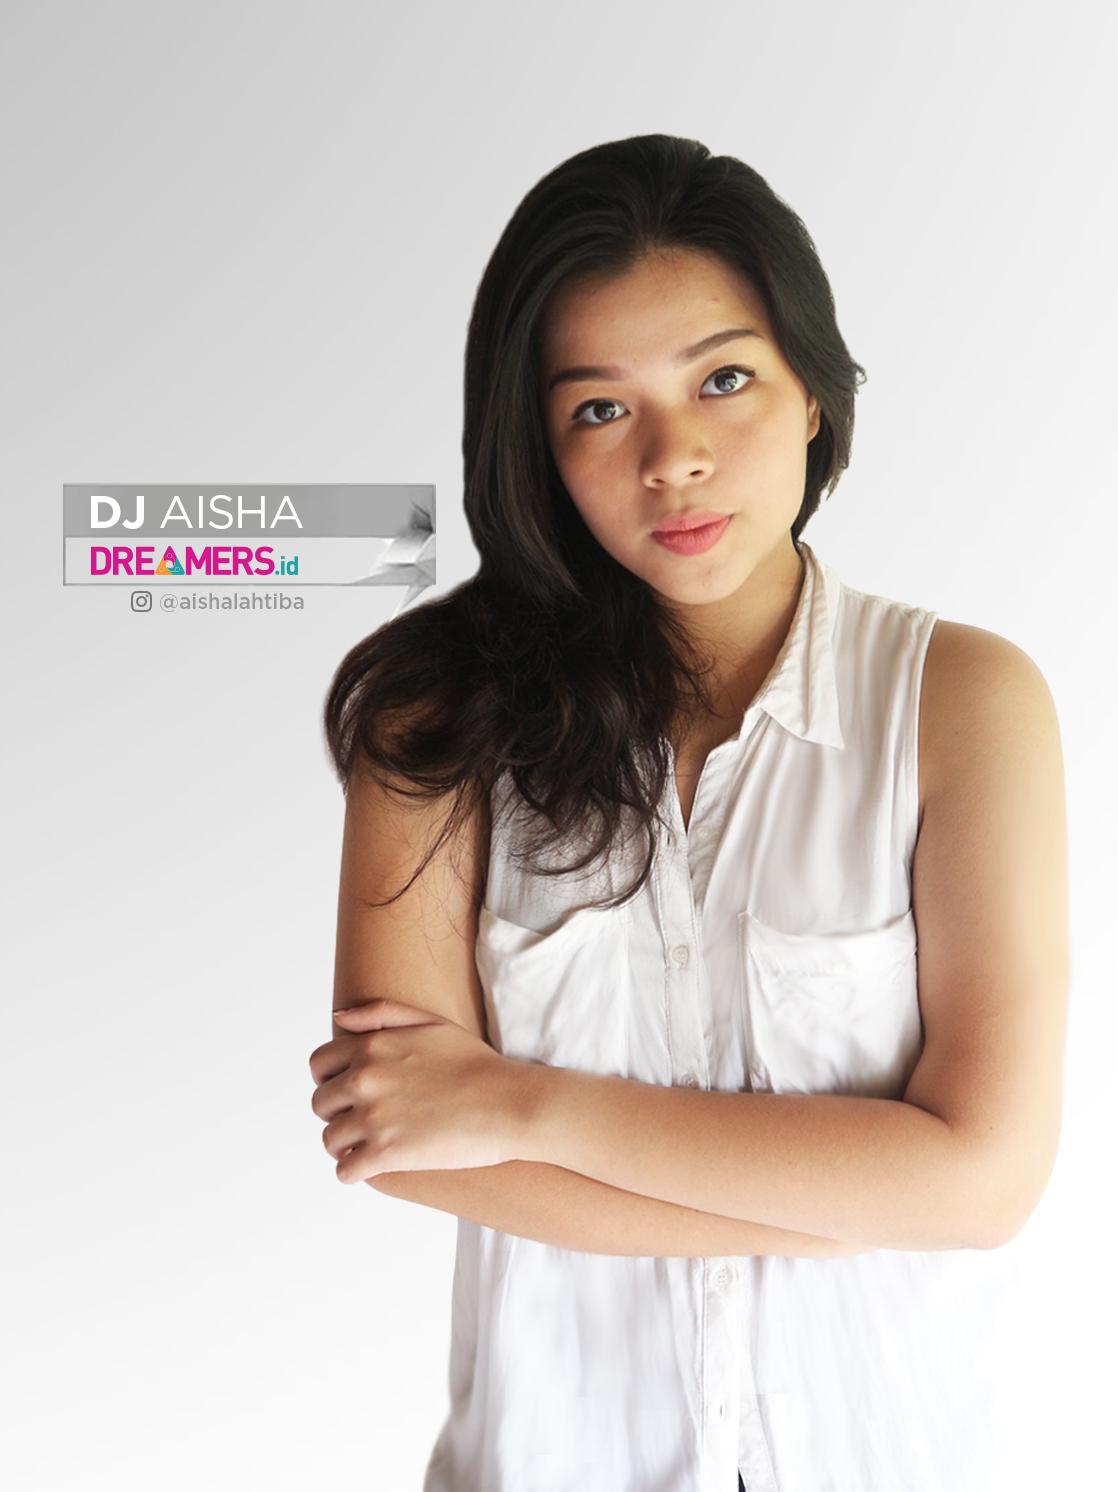 DJ Aisha